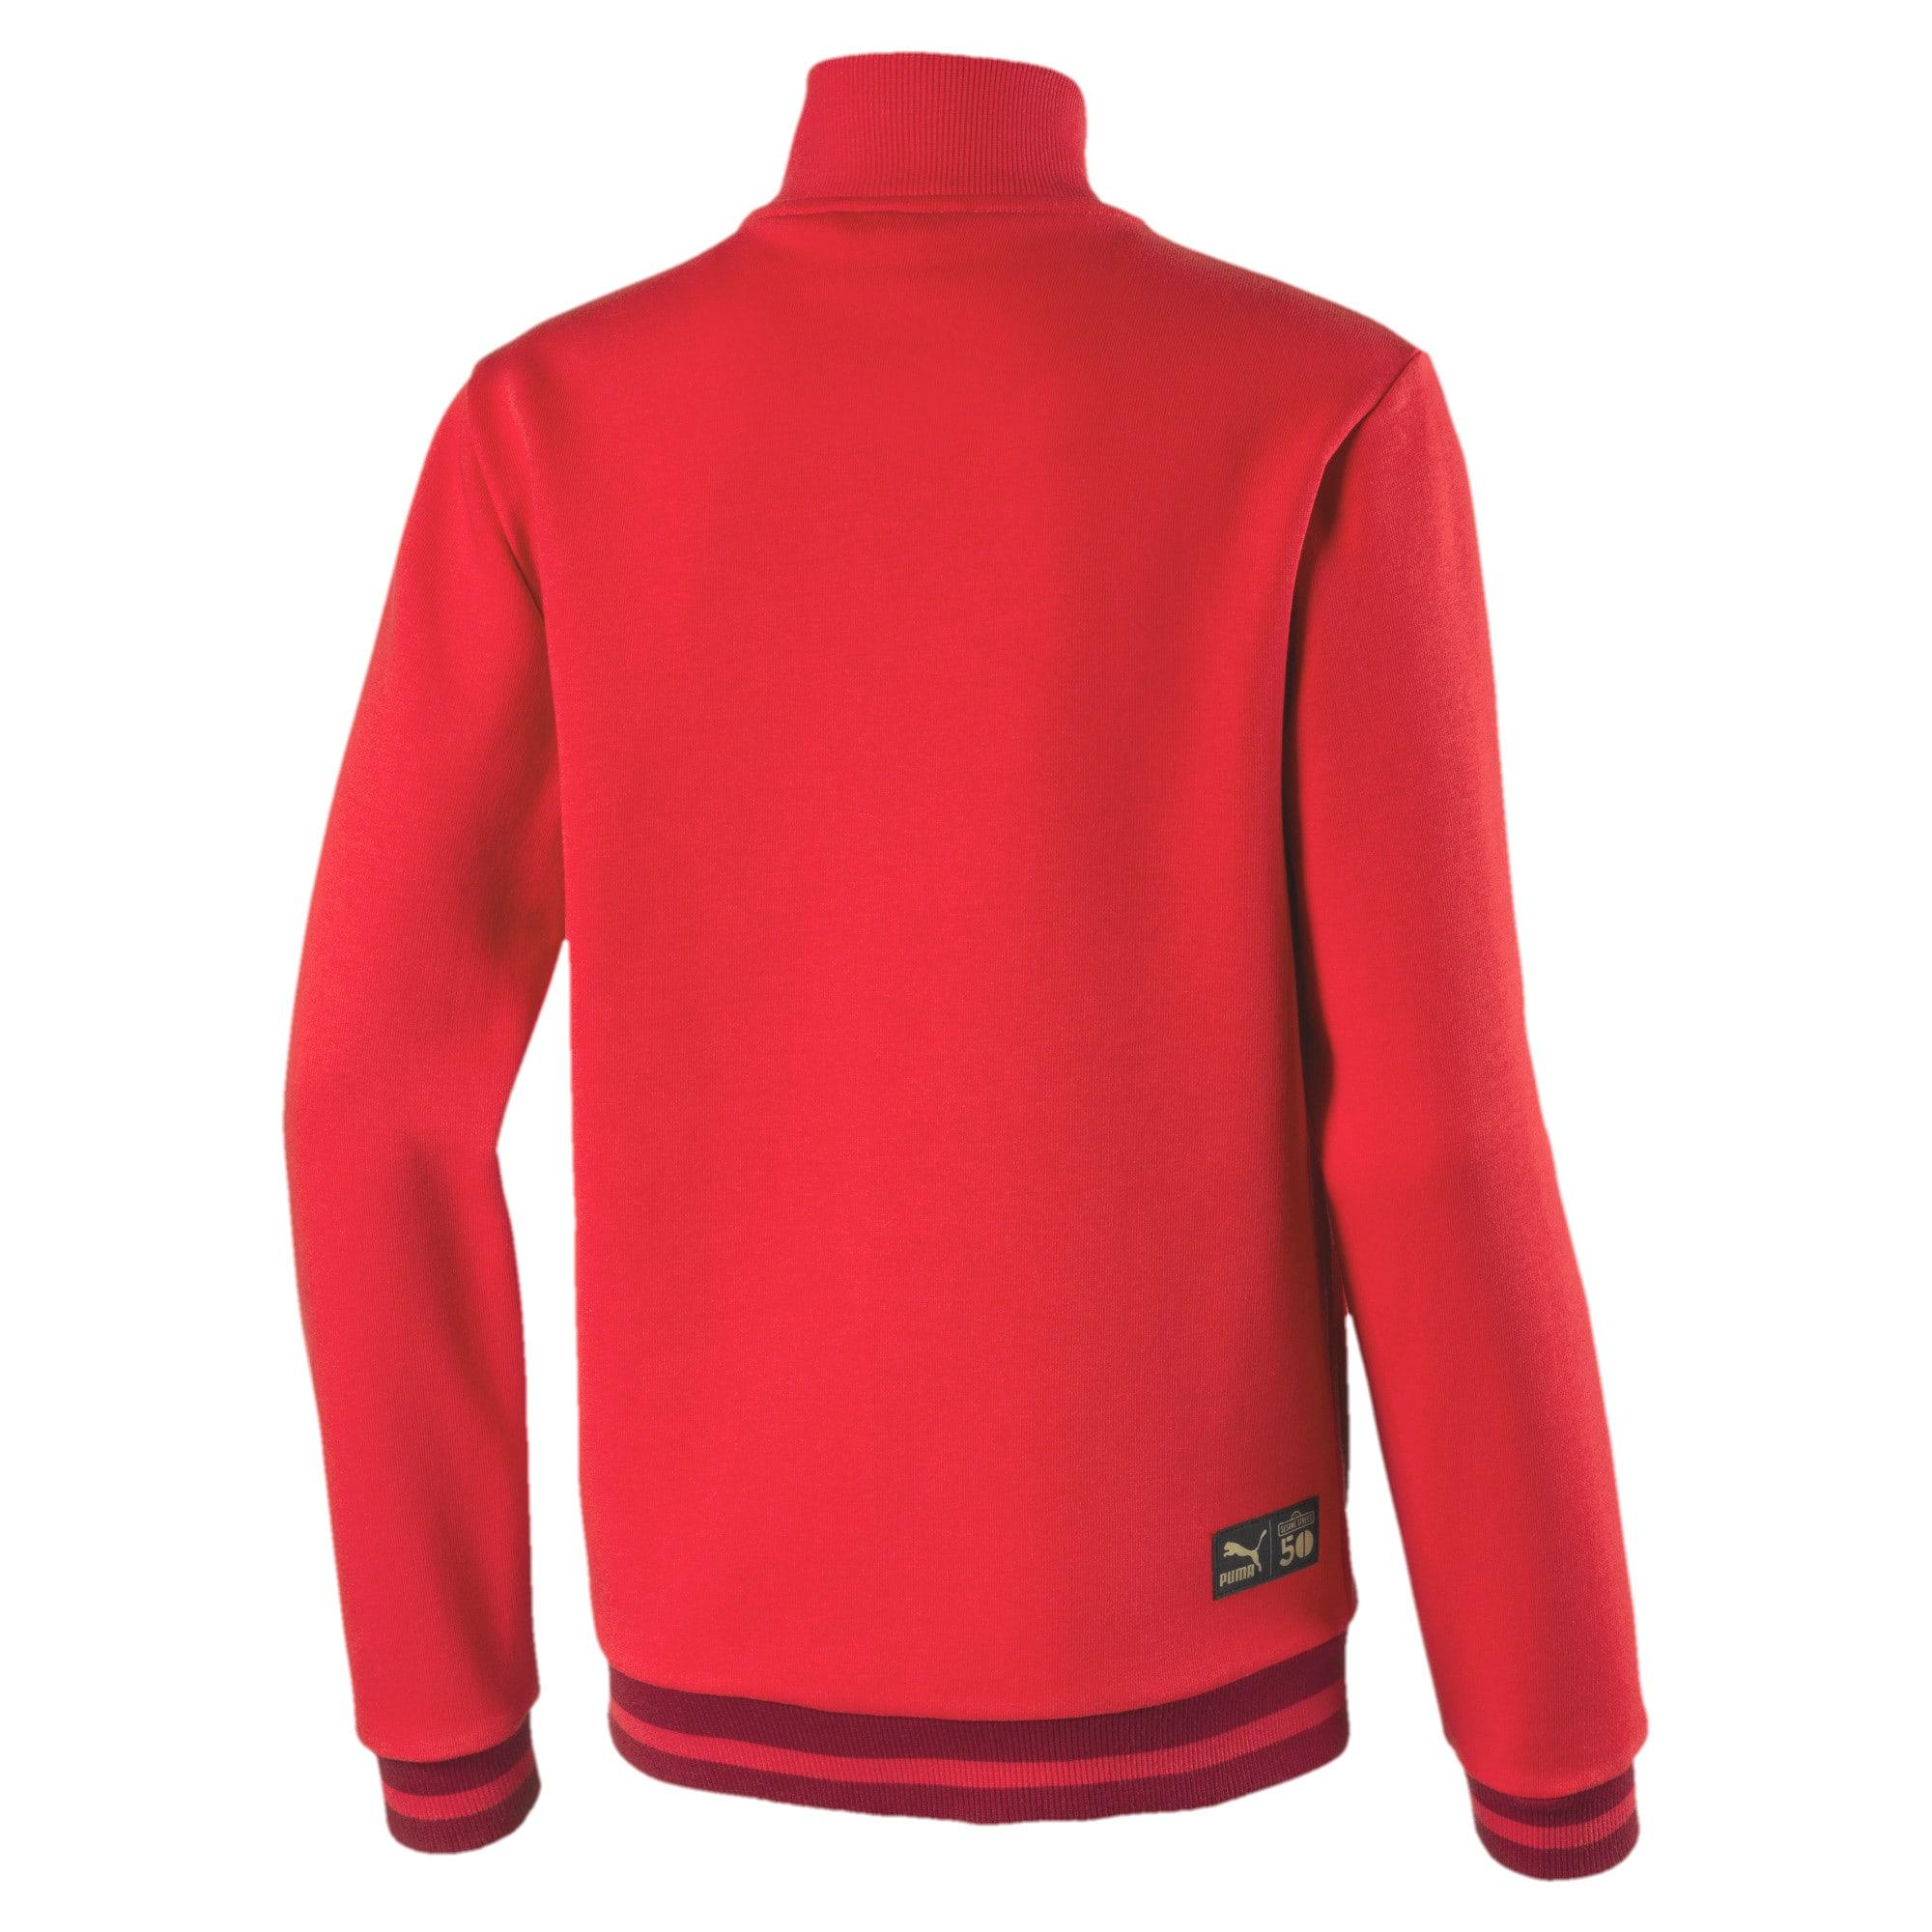 Thumbnail 2 of PUMA x SESAME STREET Kids' Sweat Jacket, High Risk Red, medium